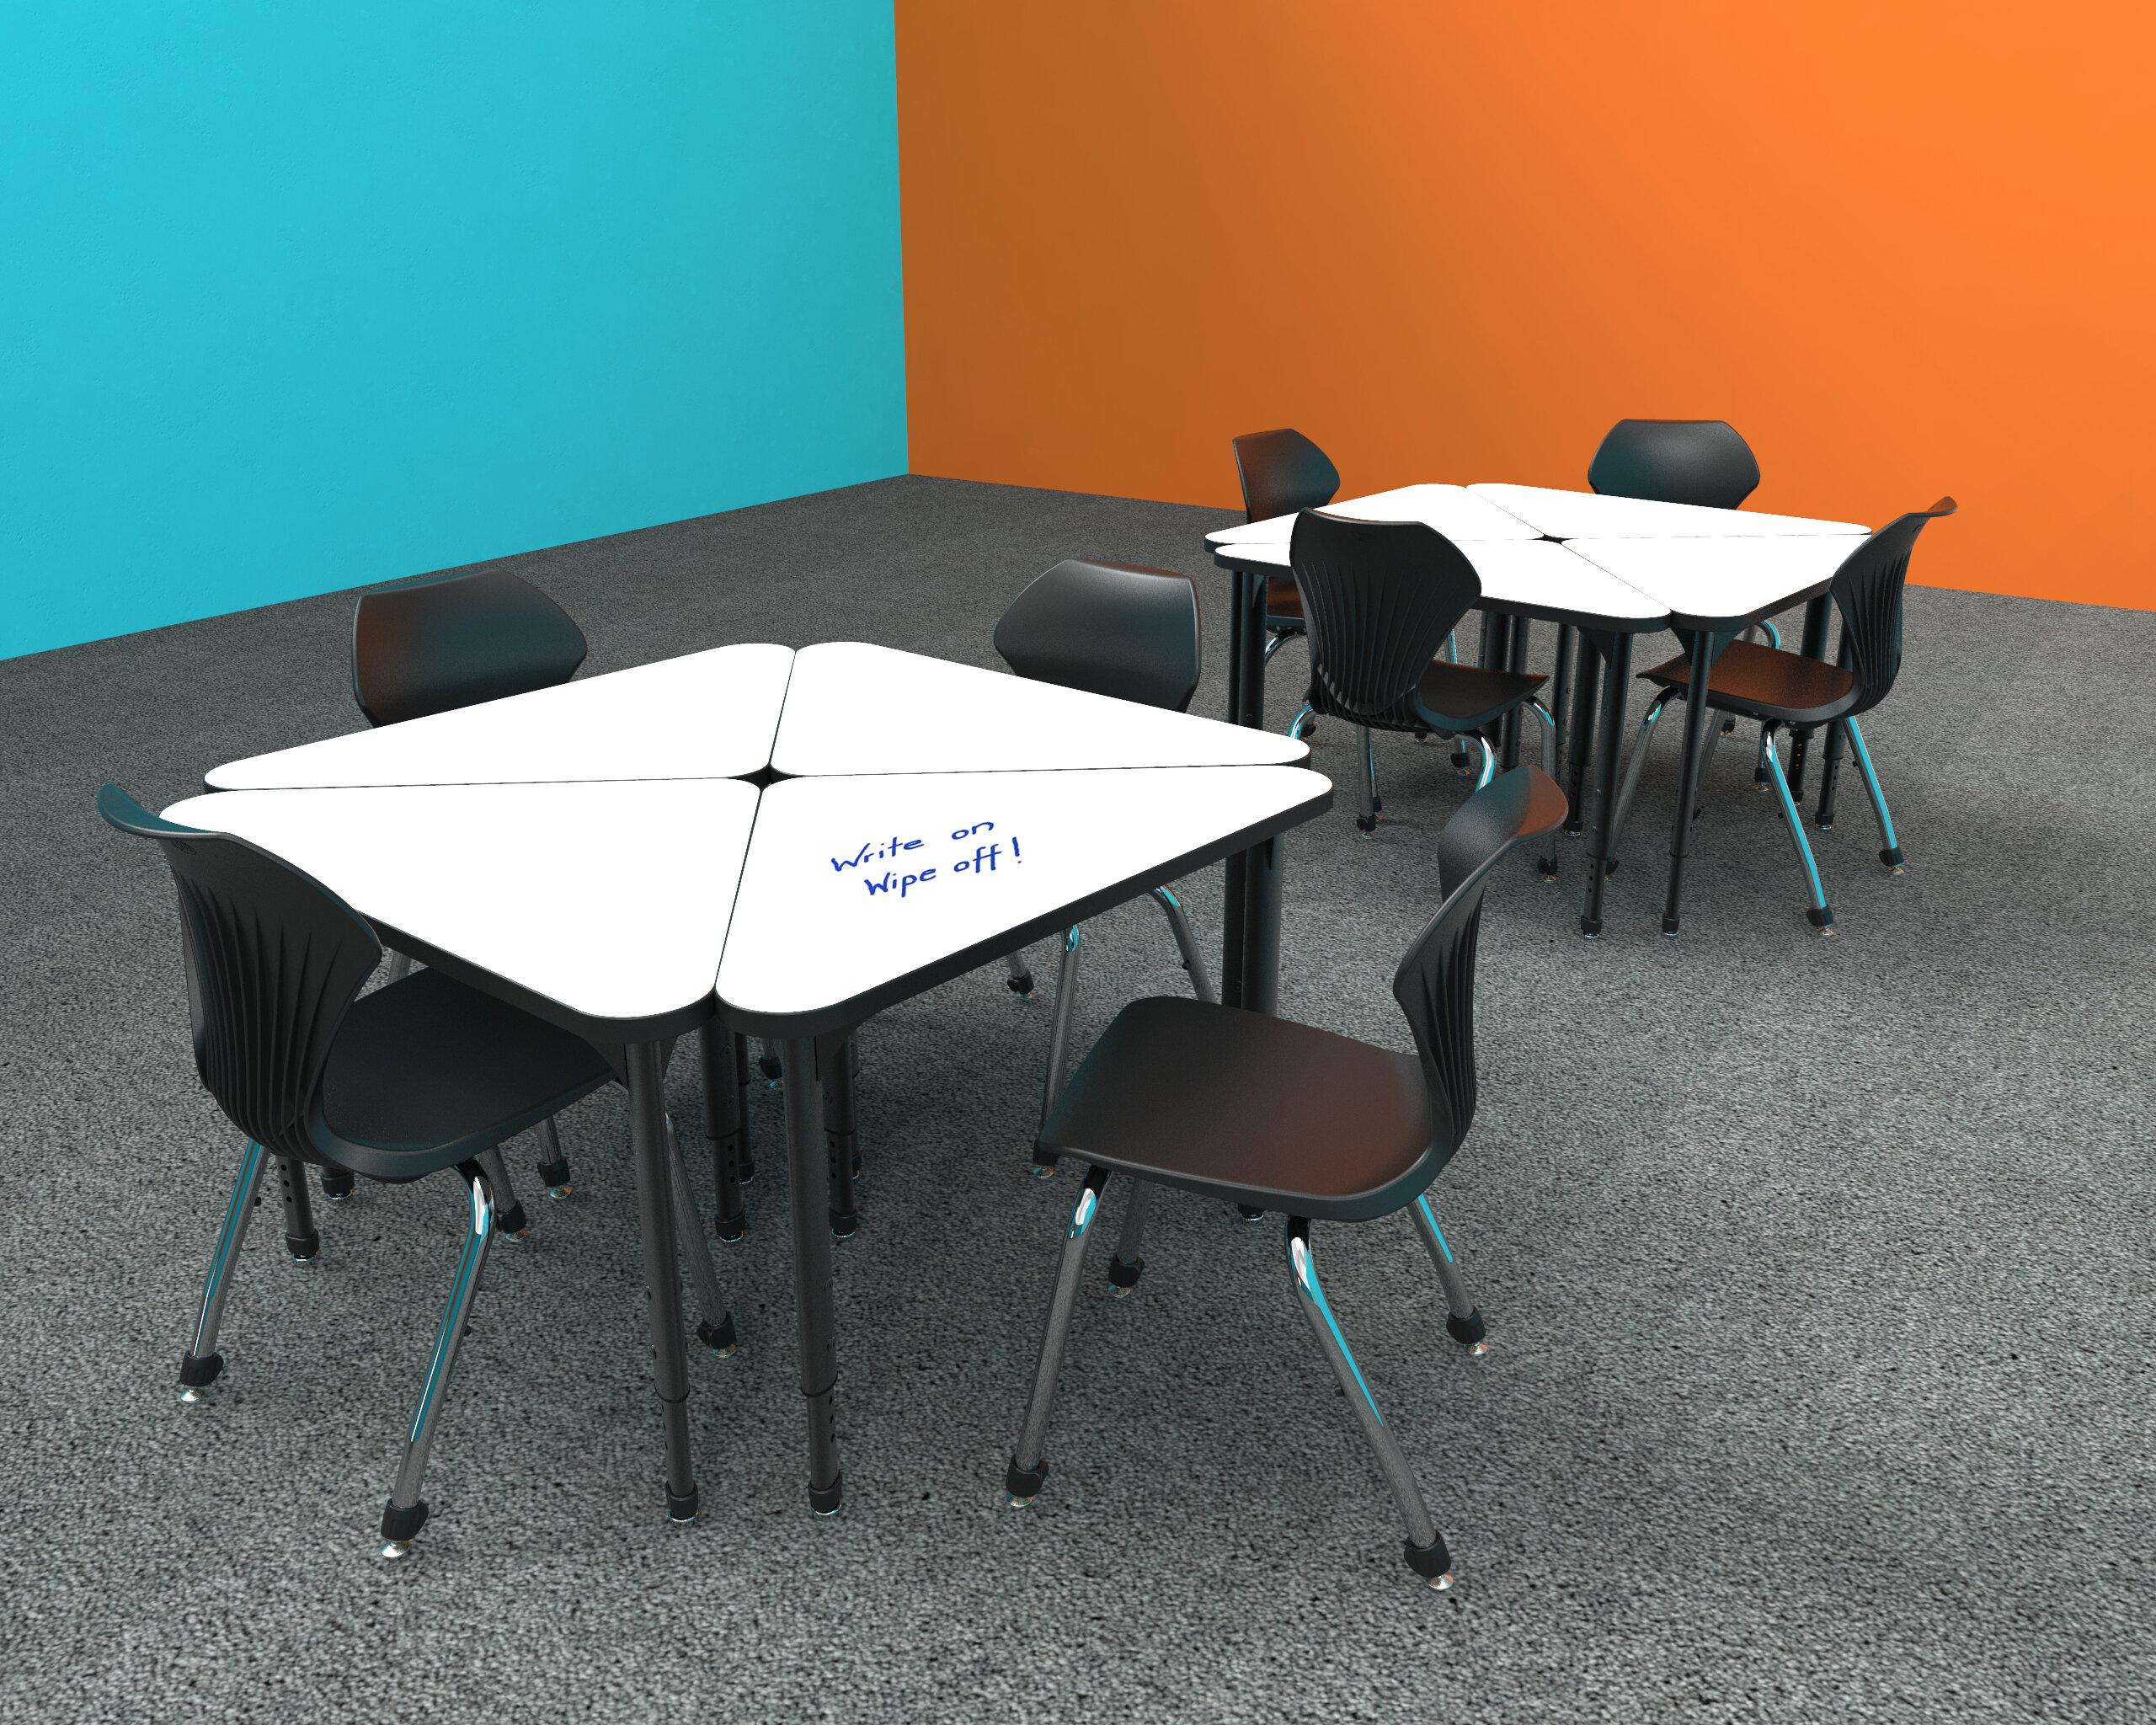 Pewter Mesh-Top Marco Group Premier Series 43a-2290-J1-BLK 38 x 31 Chevron Shaped Adjustable Height Classroom Desk Black-Edge 21-31